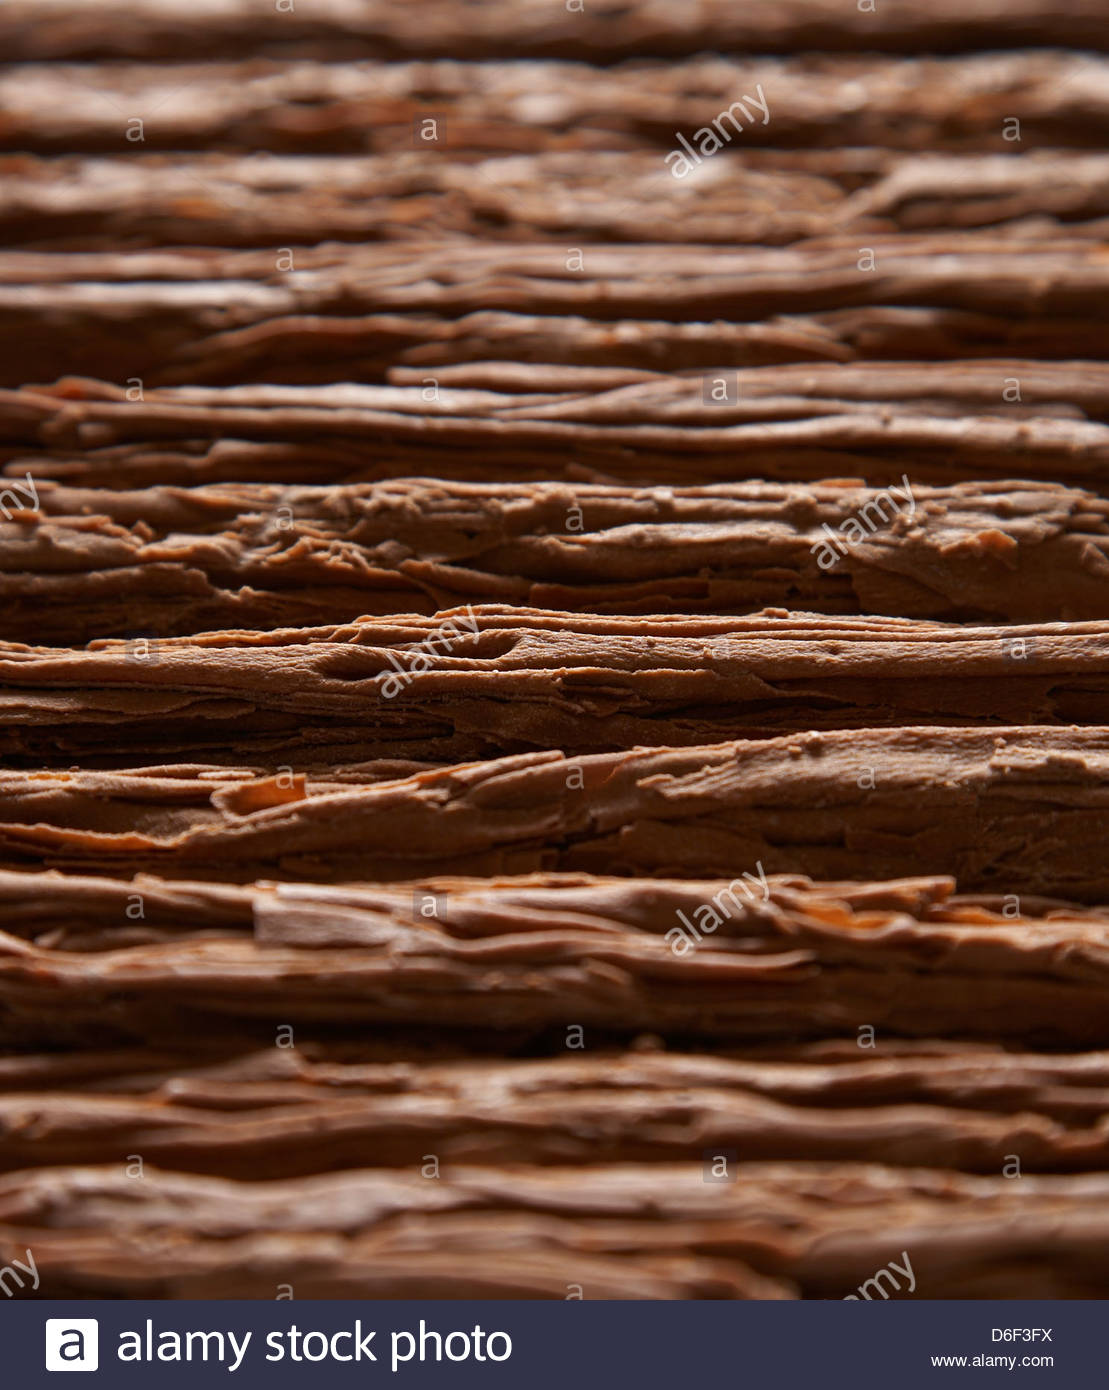 Chocolate Flake sticks - Stock Image